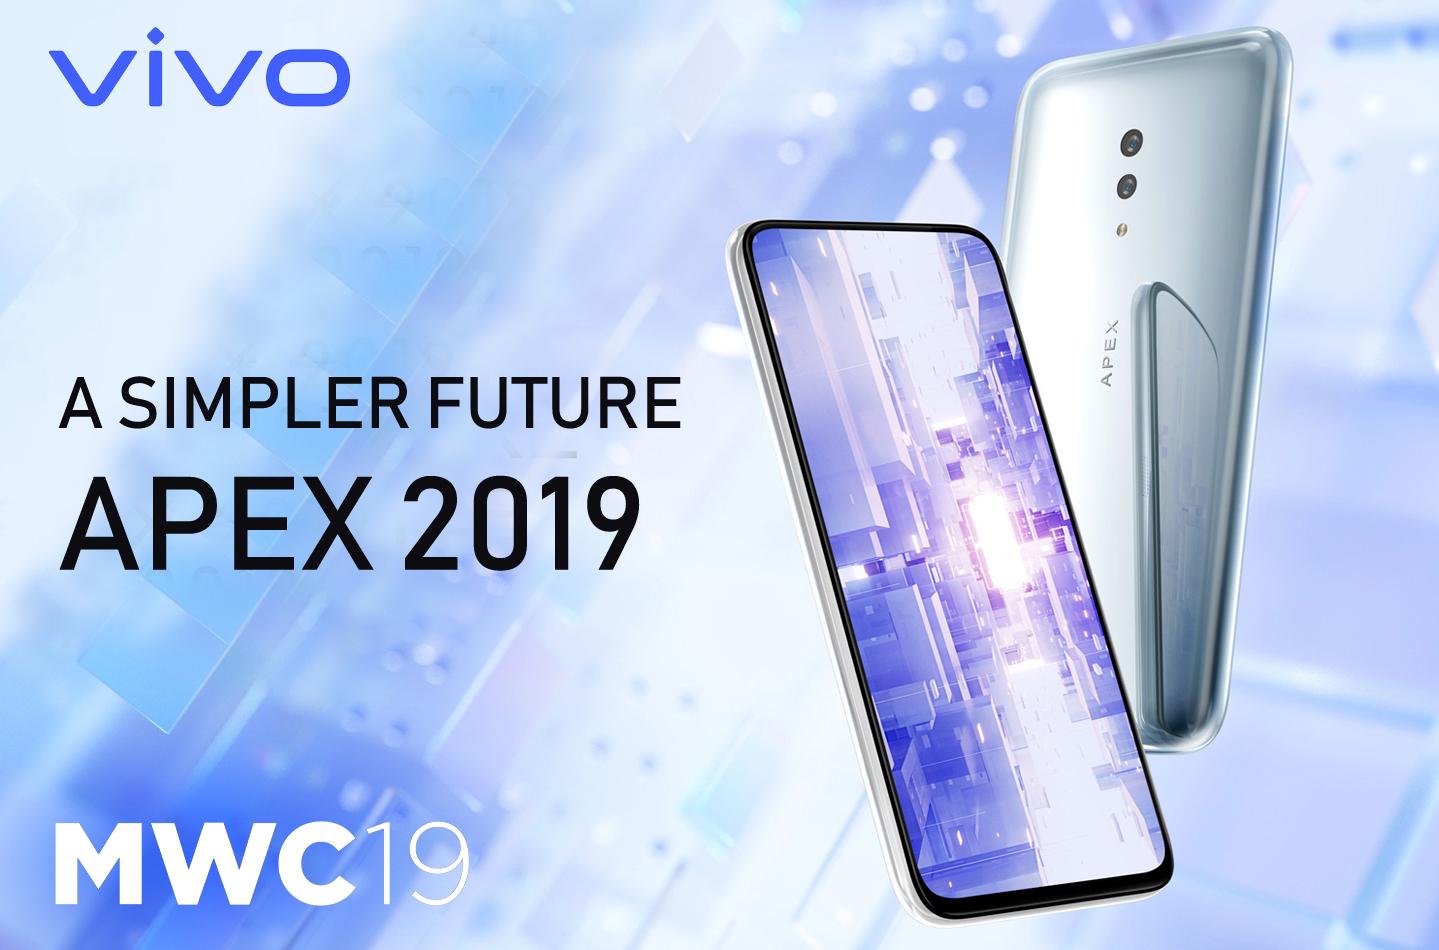 VIVO smartphones MWC 2019